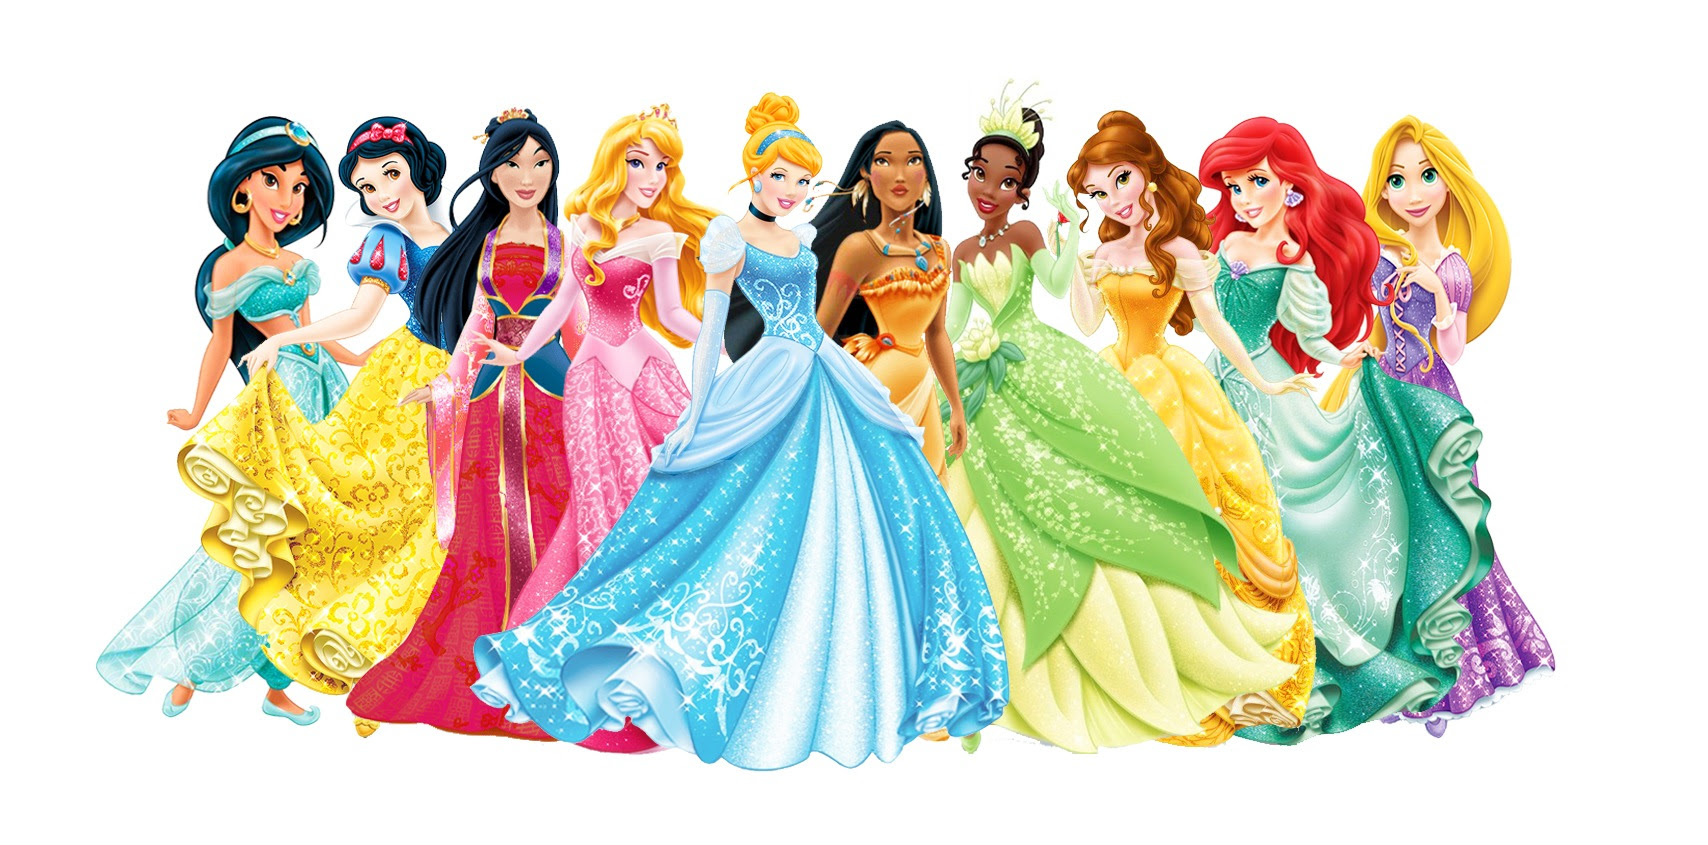 Disney Princess Lineup - Disney Princess Photo (35768362 ...